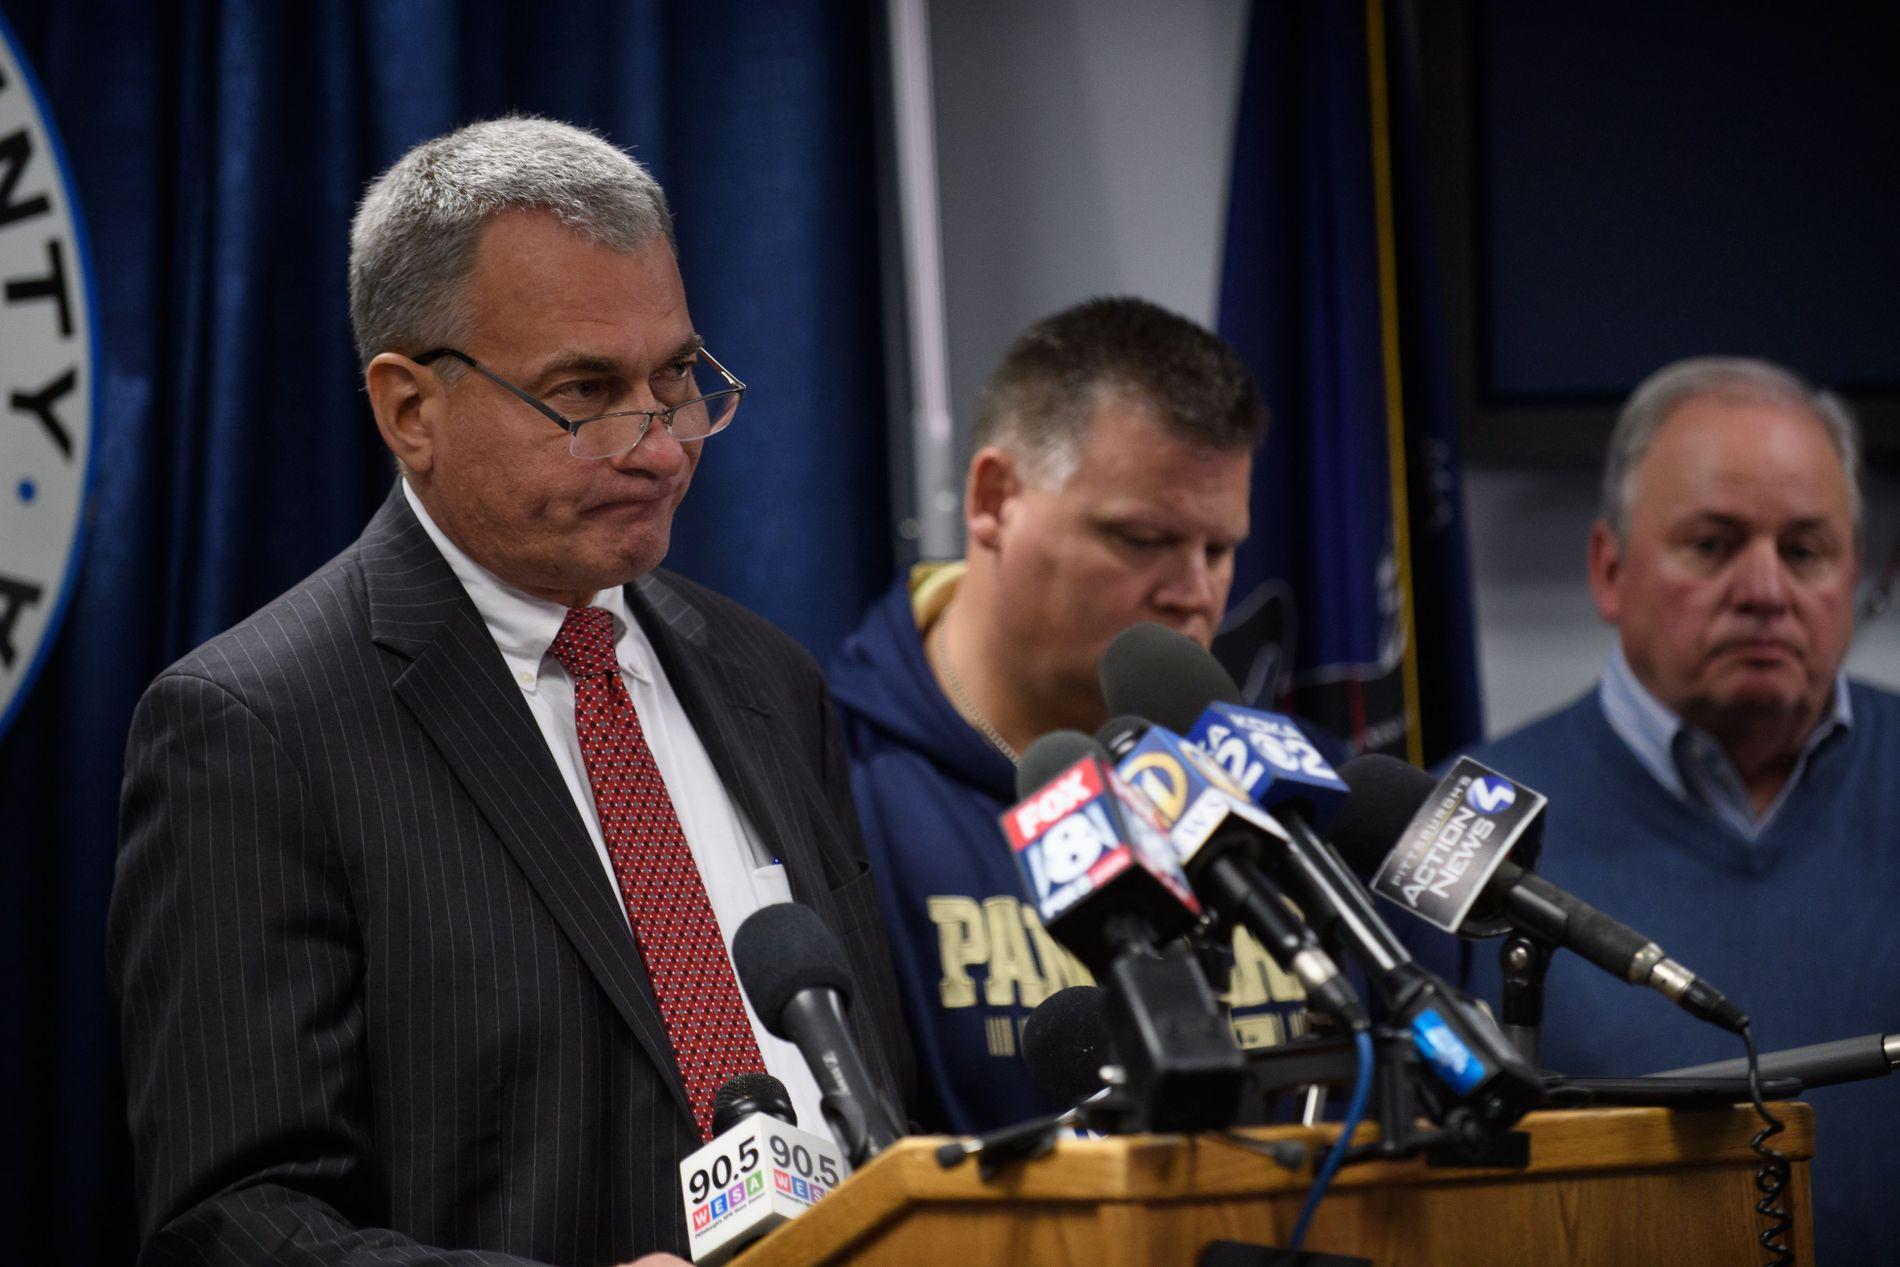 FORFERDELIG: Under pressekonferansen beskrev politisjefen i byen åstedet som «forferdelig».